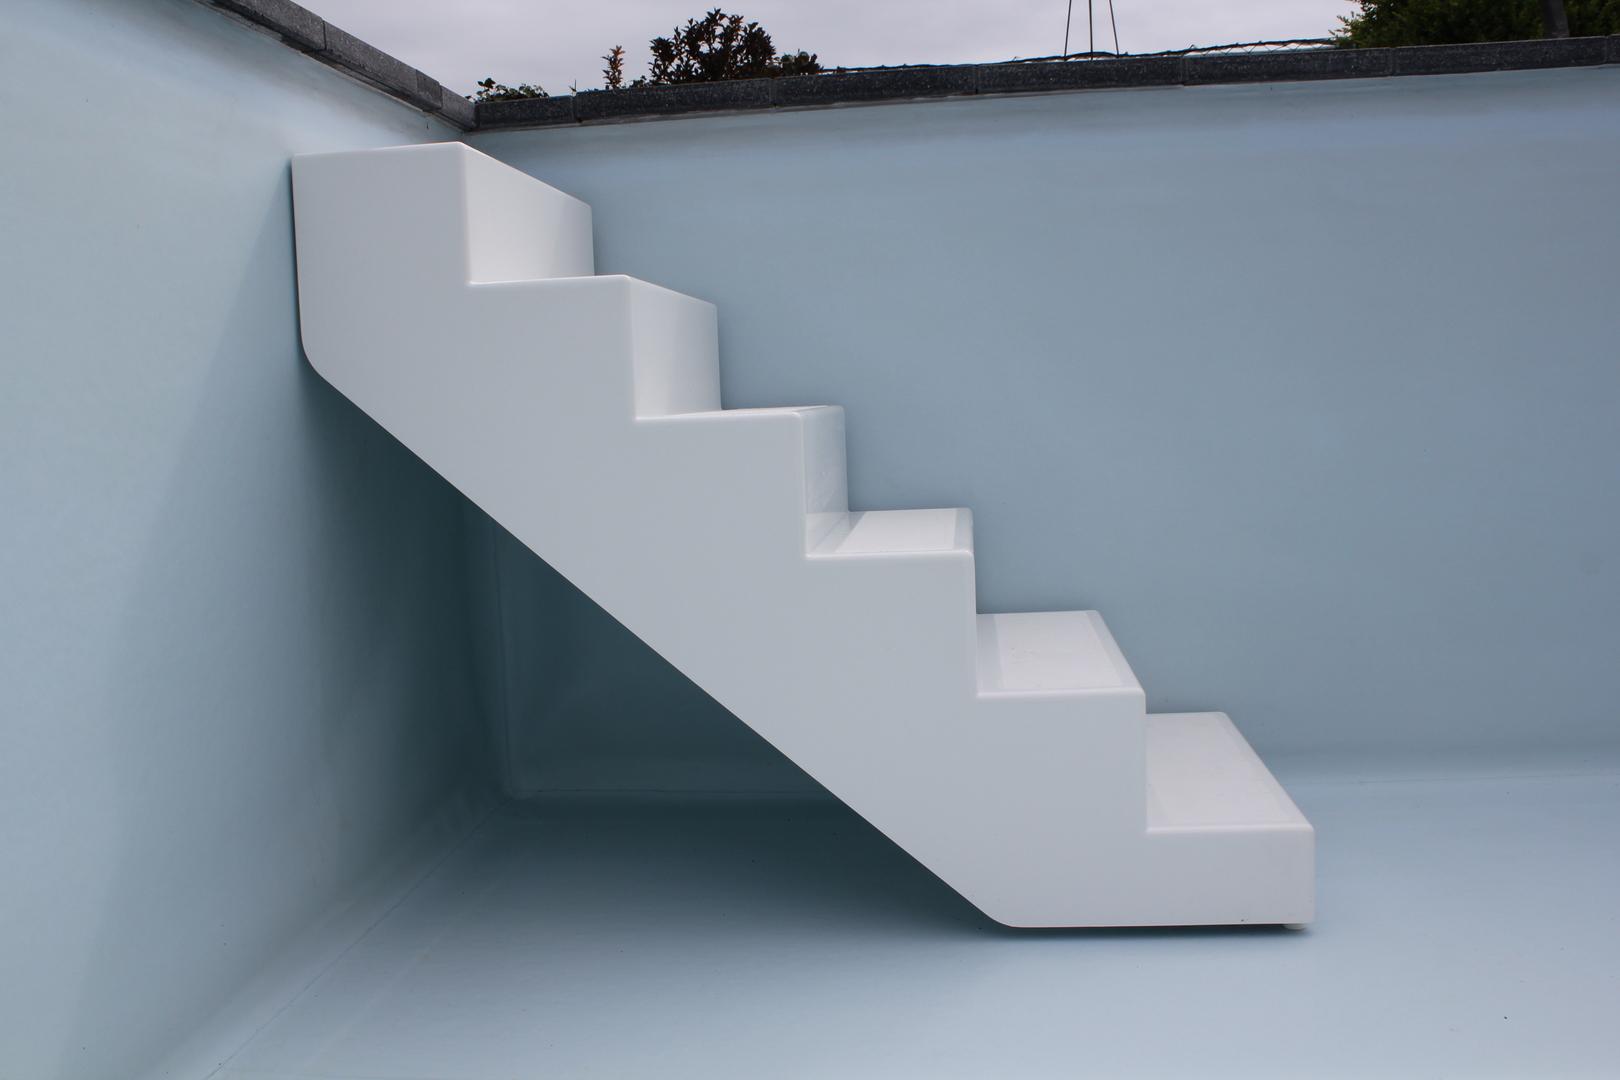 individuelle fertigung von gfk formteilen f r pools. Black Bedroom Furniture Sets. Home Design Ideas